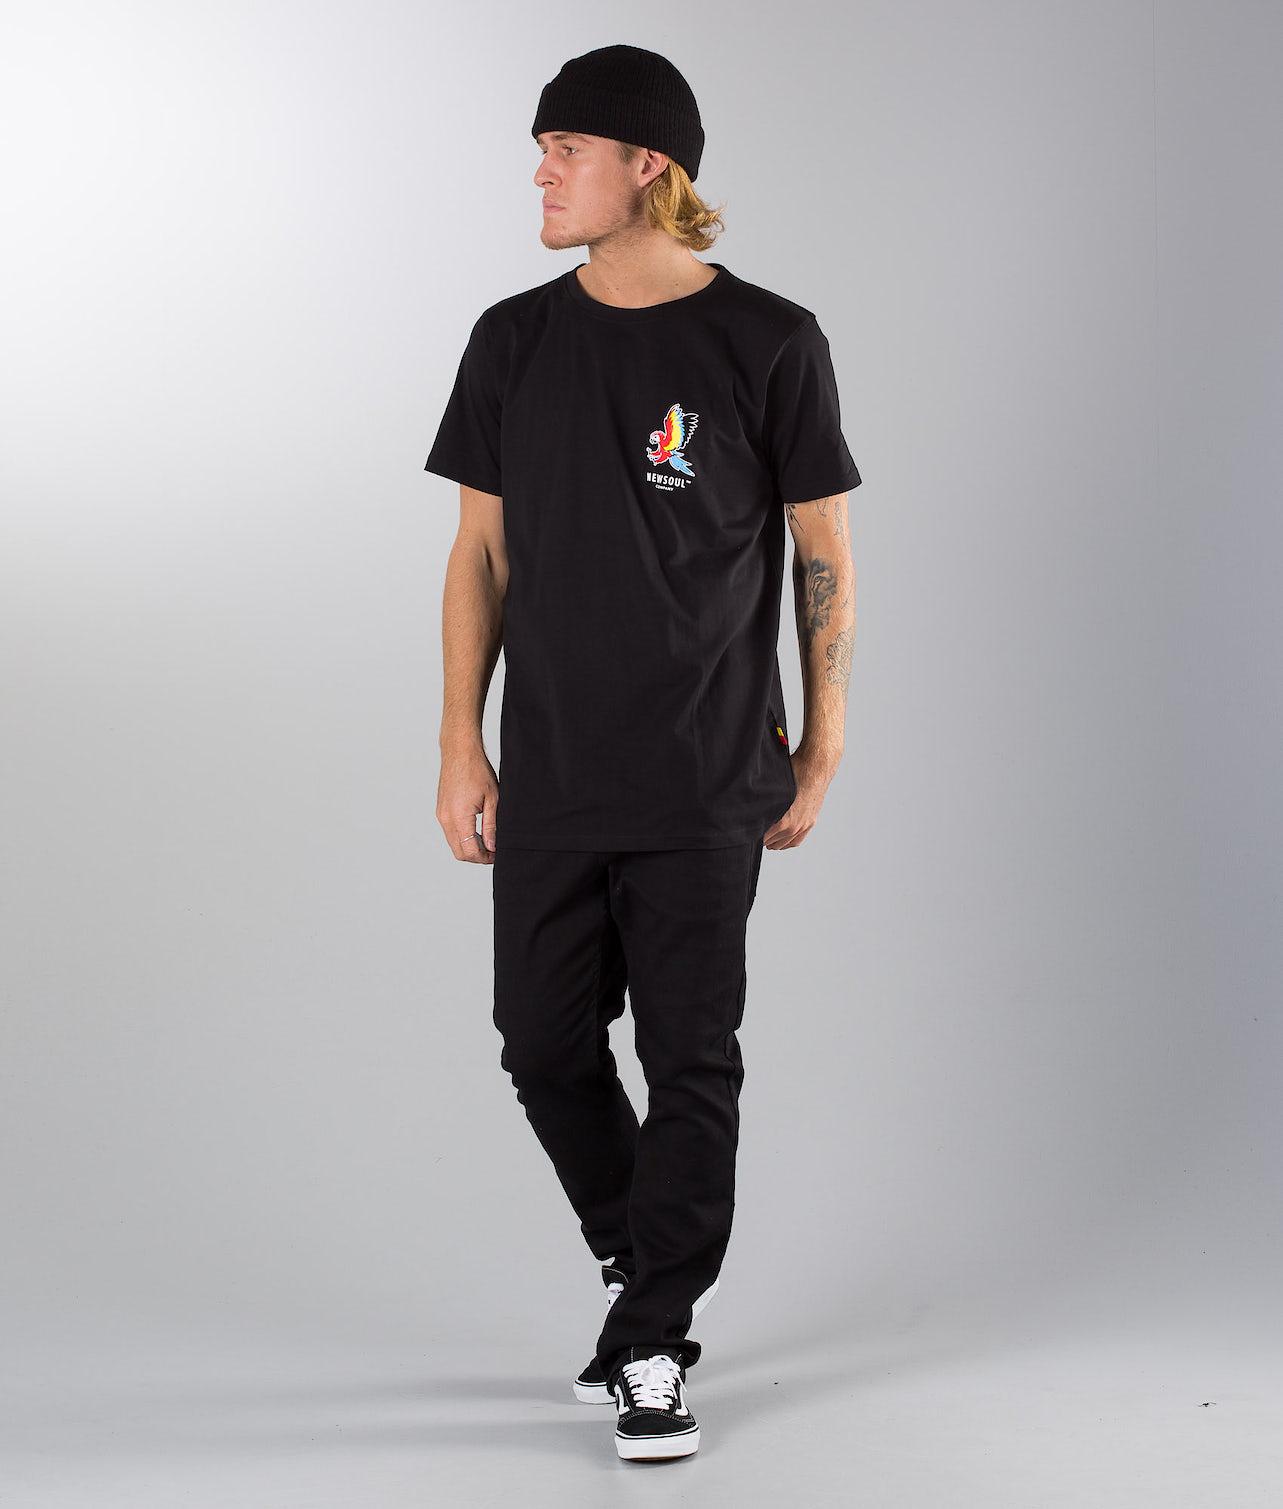 Newsoul Birdie namnam T-shirt Black